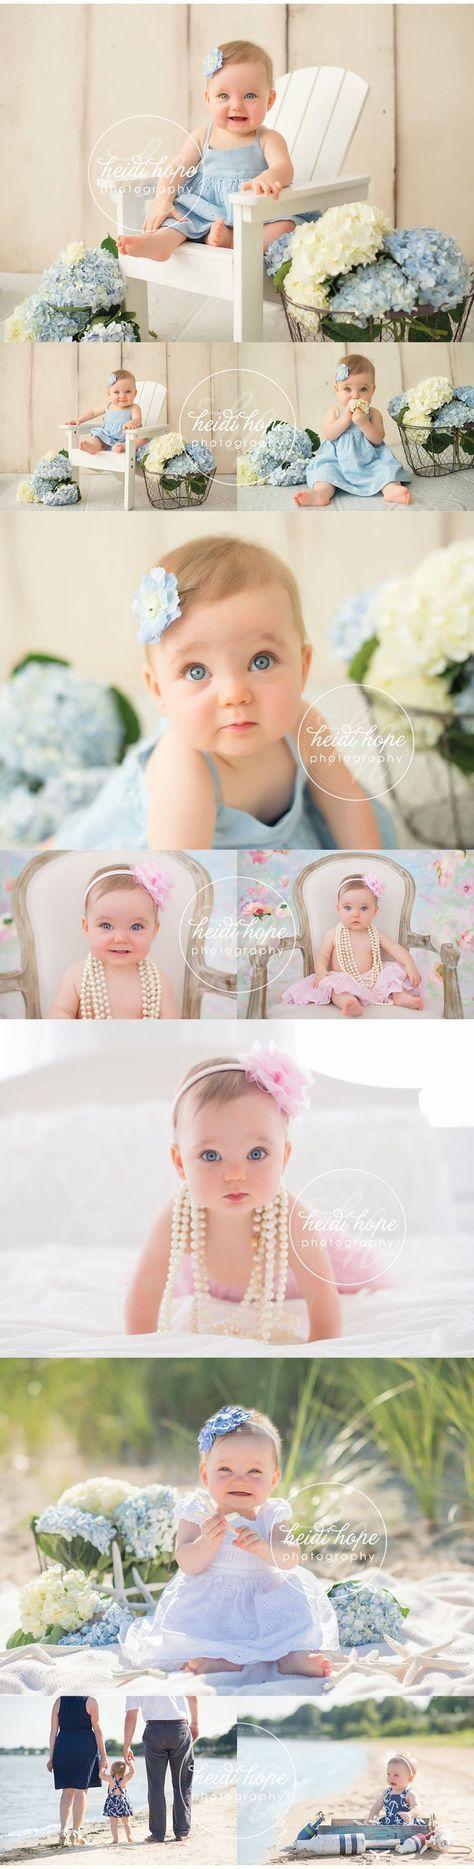 Newborn Photography Poses, so cute